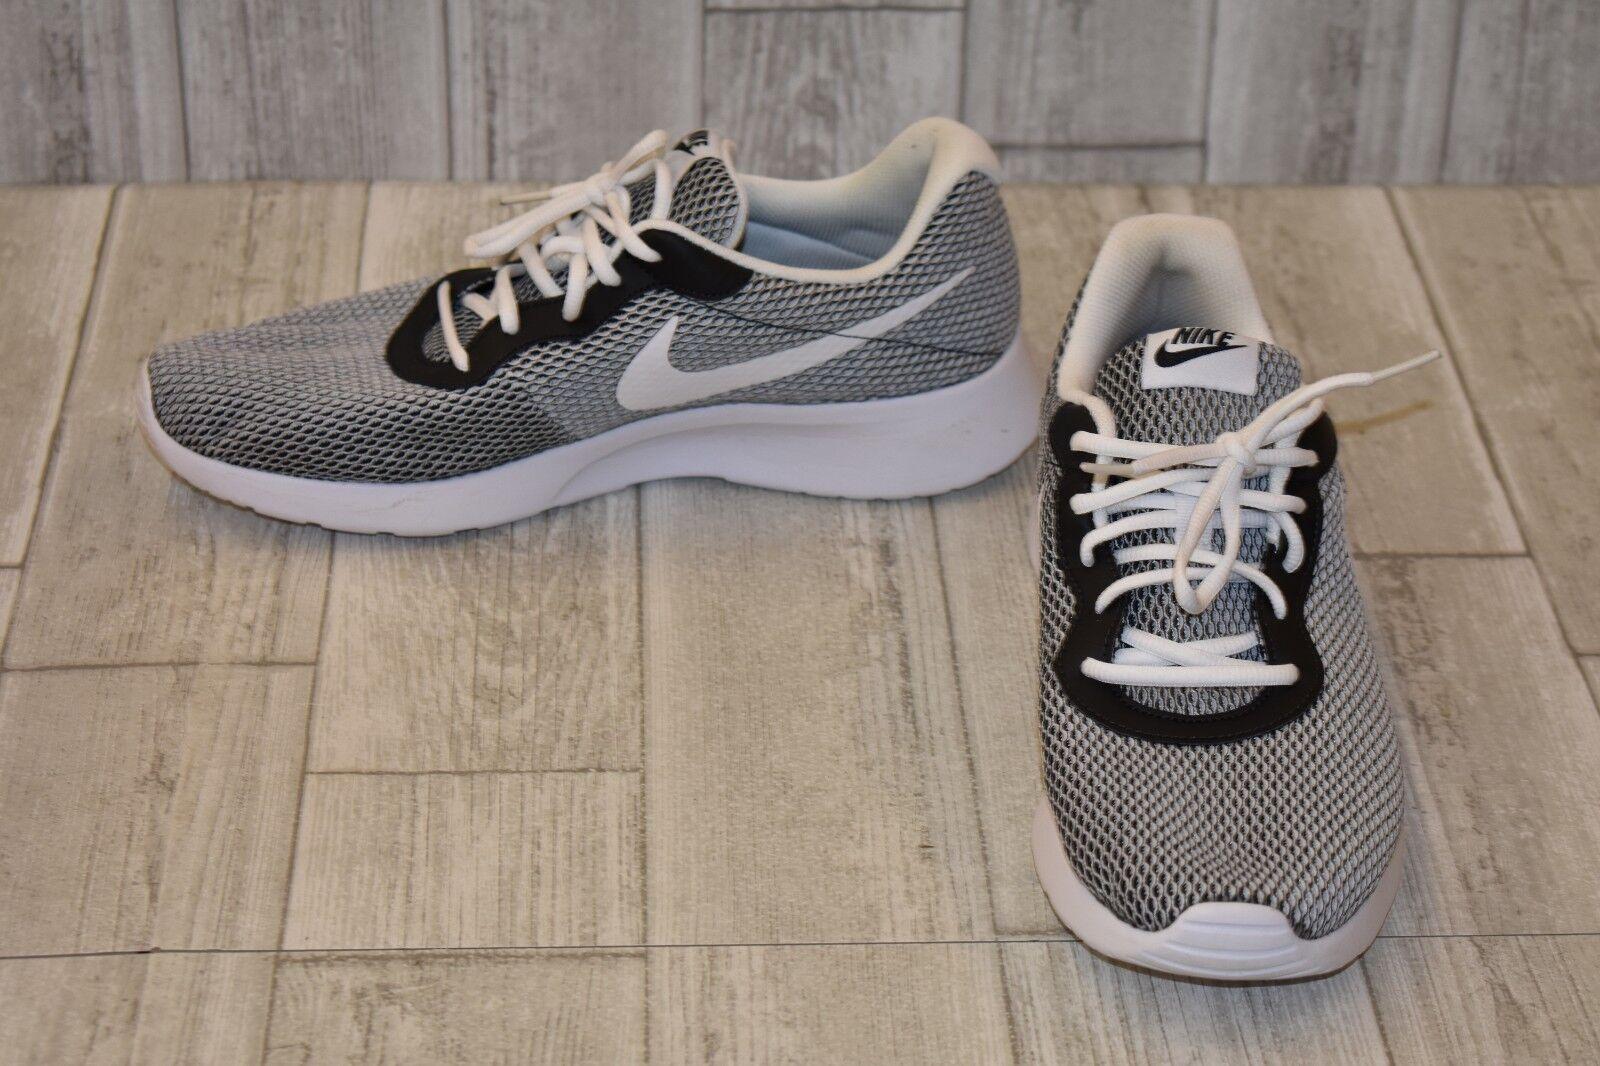 267d40446cf Nike Tanjun SE Lightweight Running Shoes